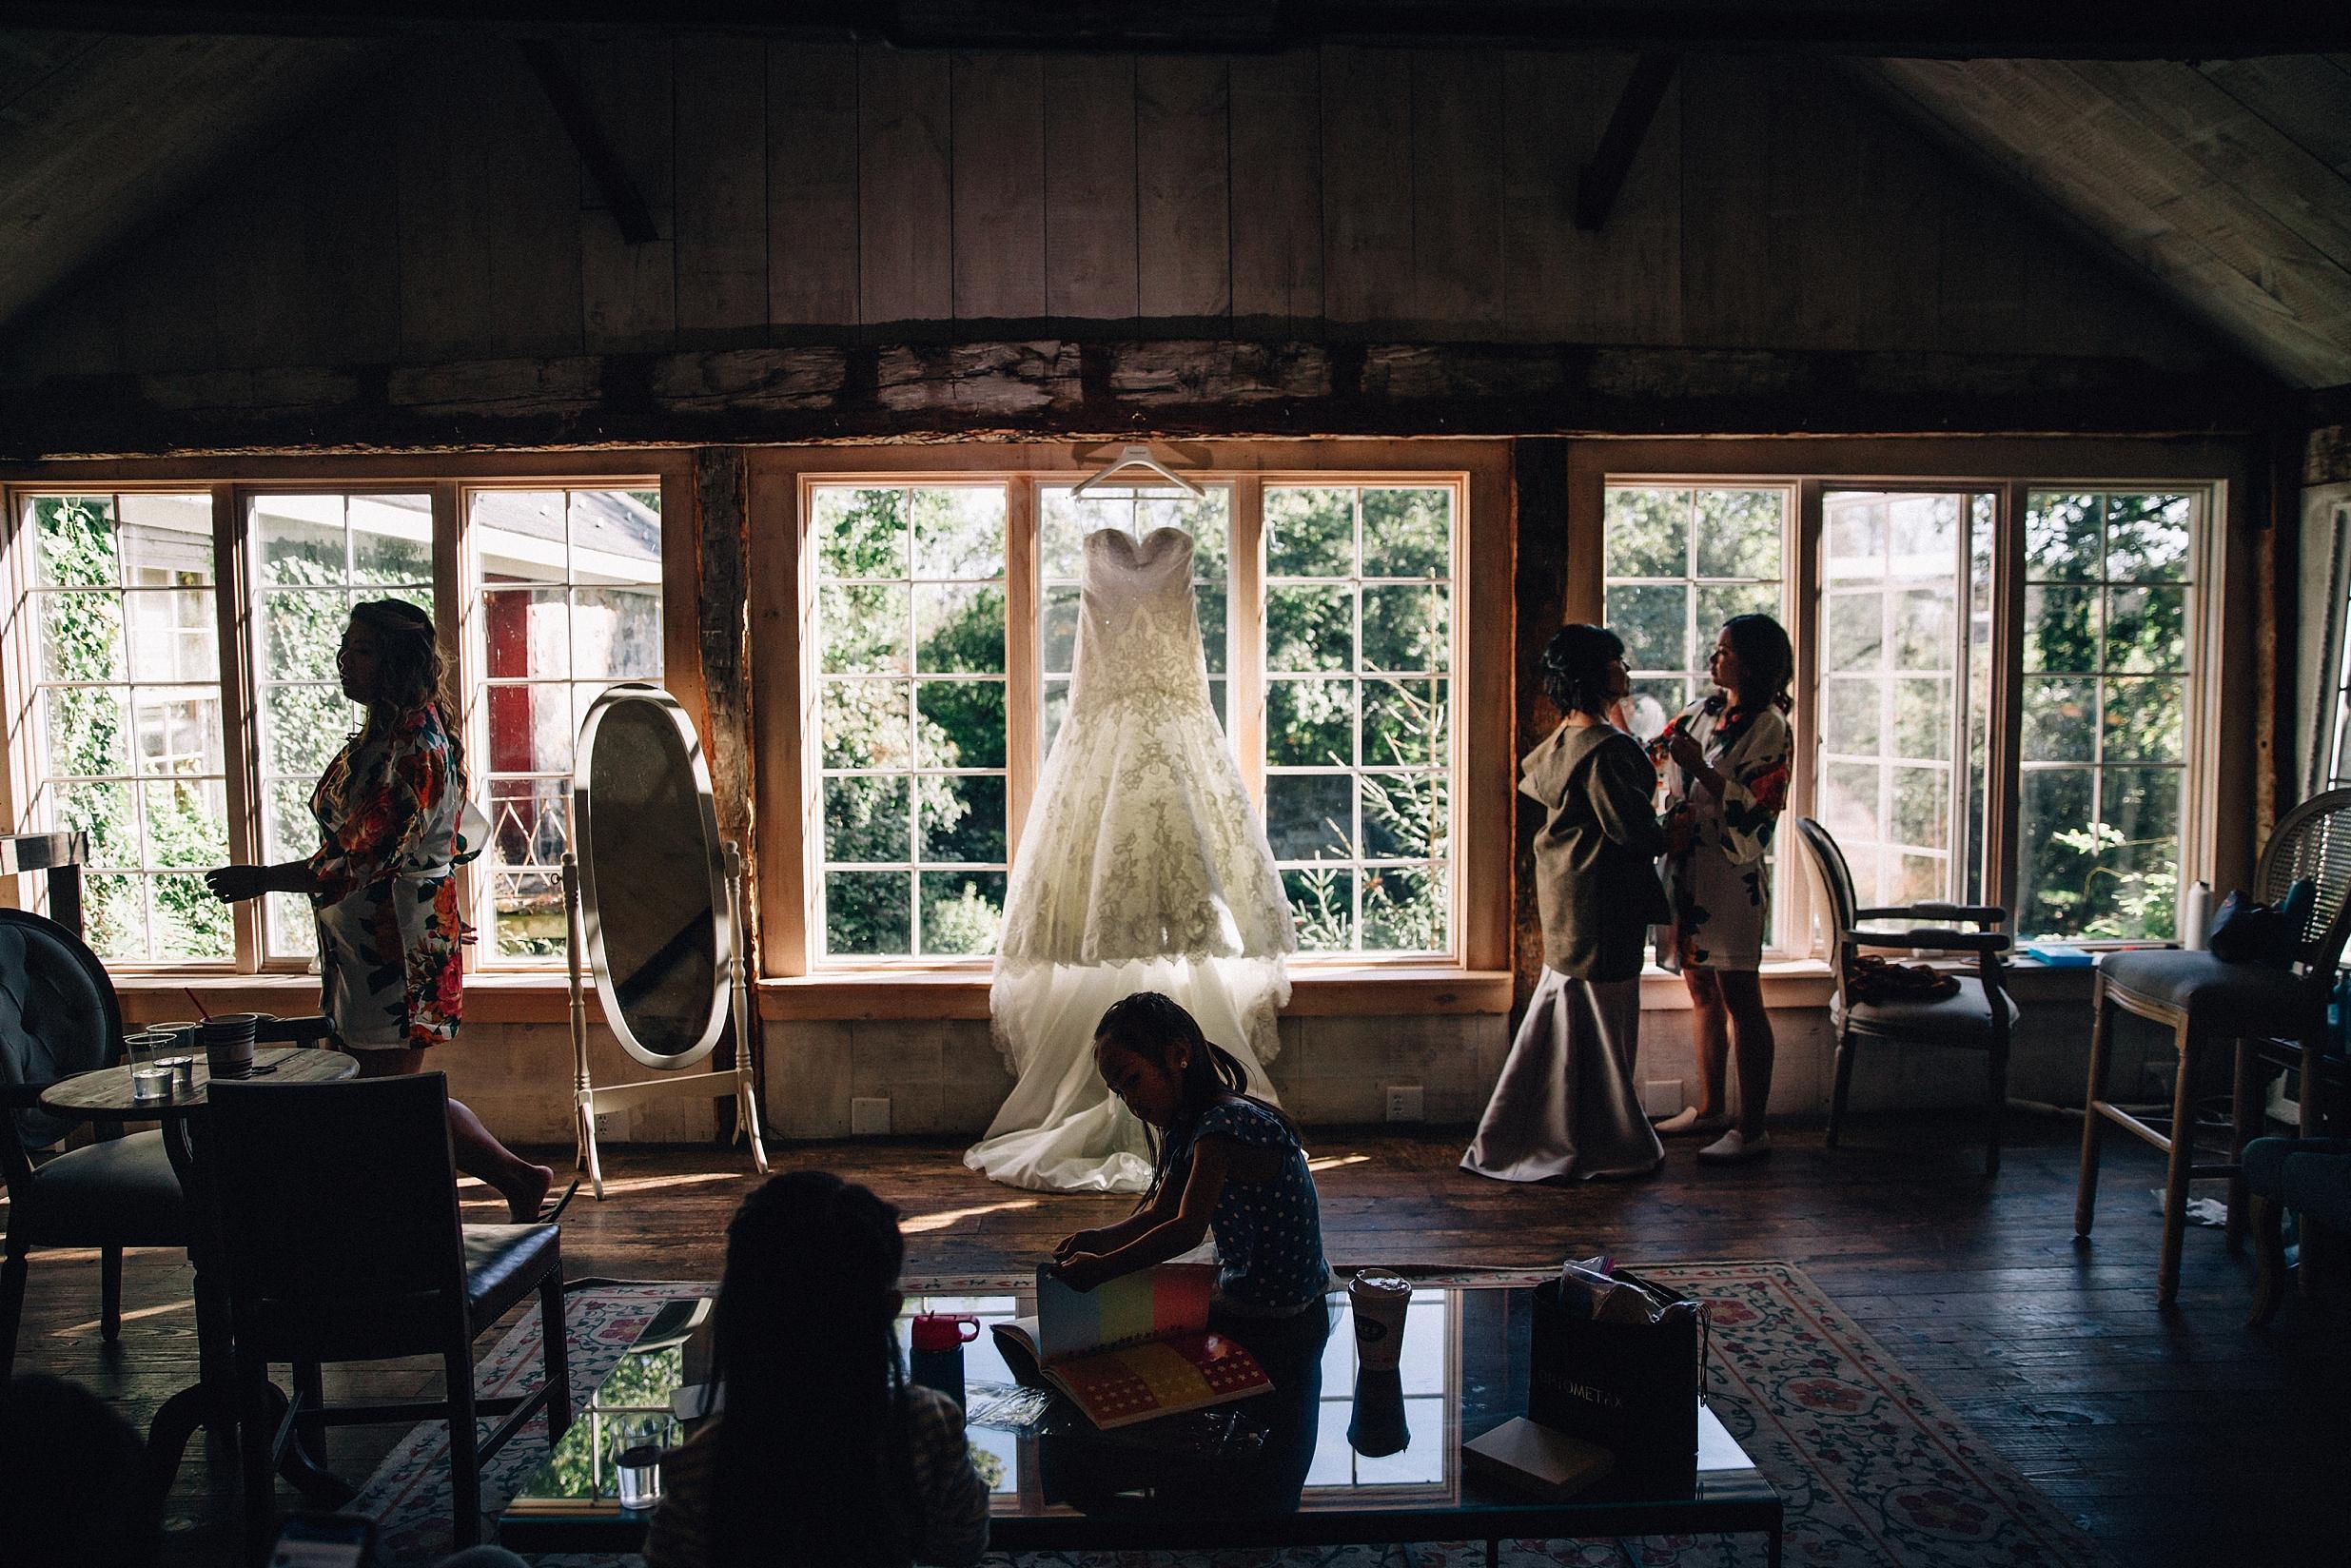 crossed-keys-estate-filipino-wedding-nj_0005.jpg